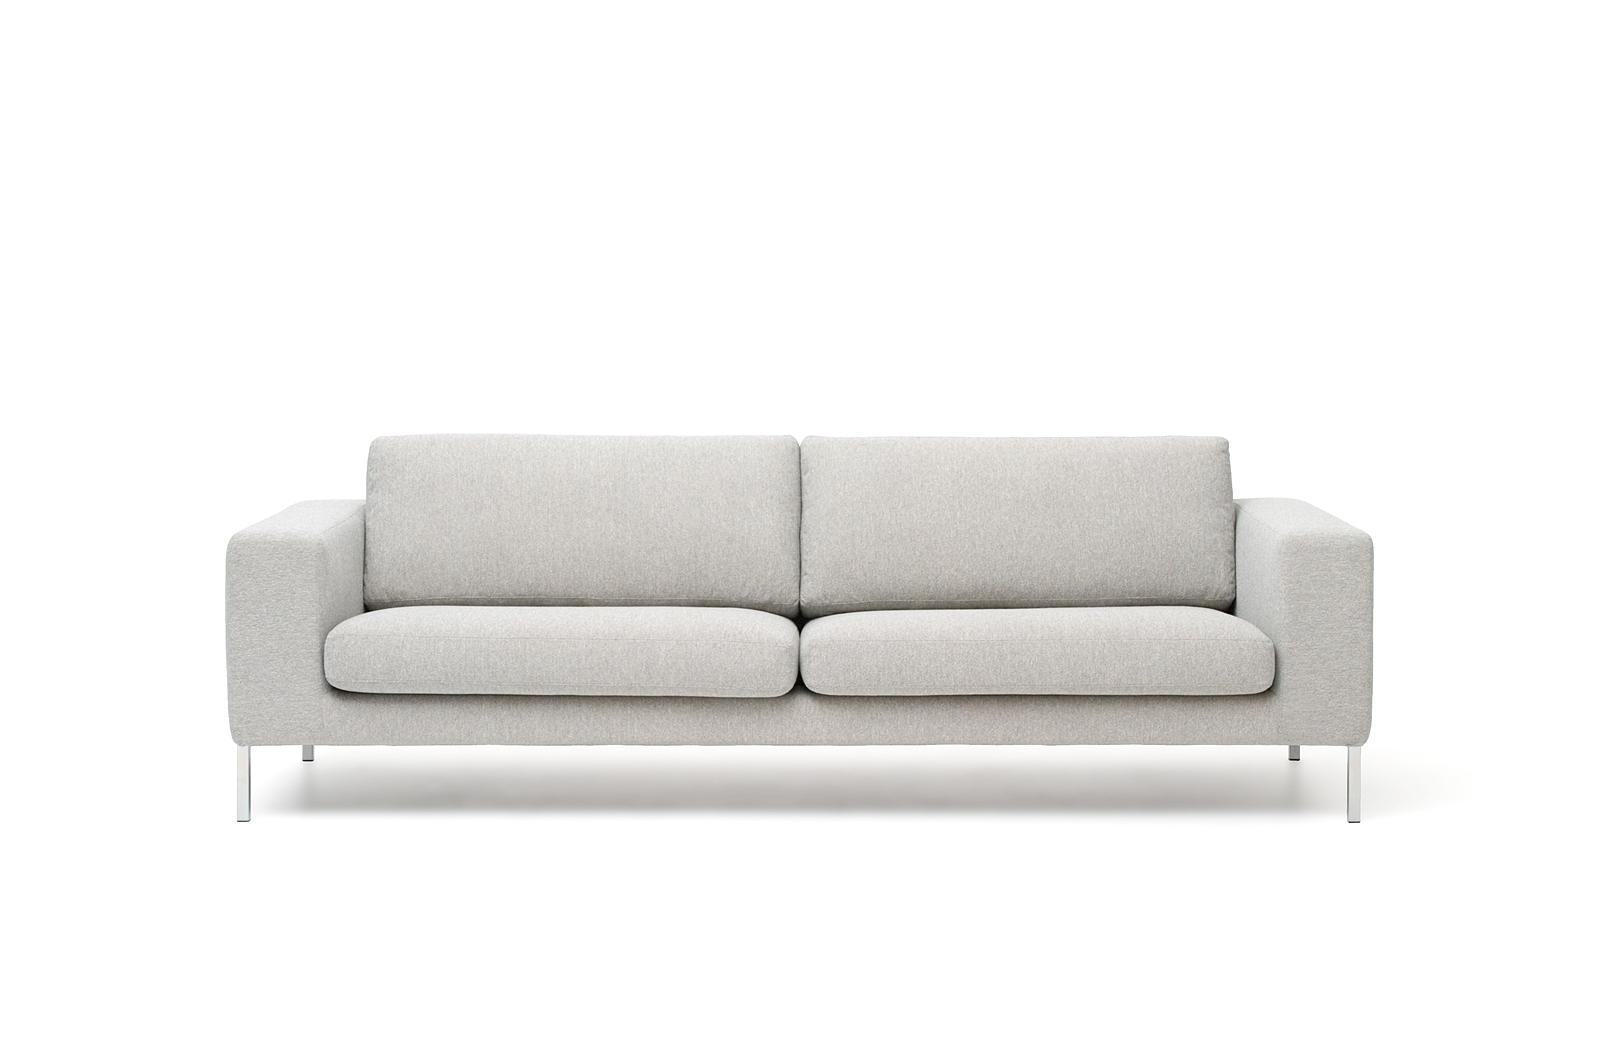 Neo | Bensen Throughout Bensen Sofas (Image 17 of 20)